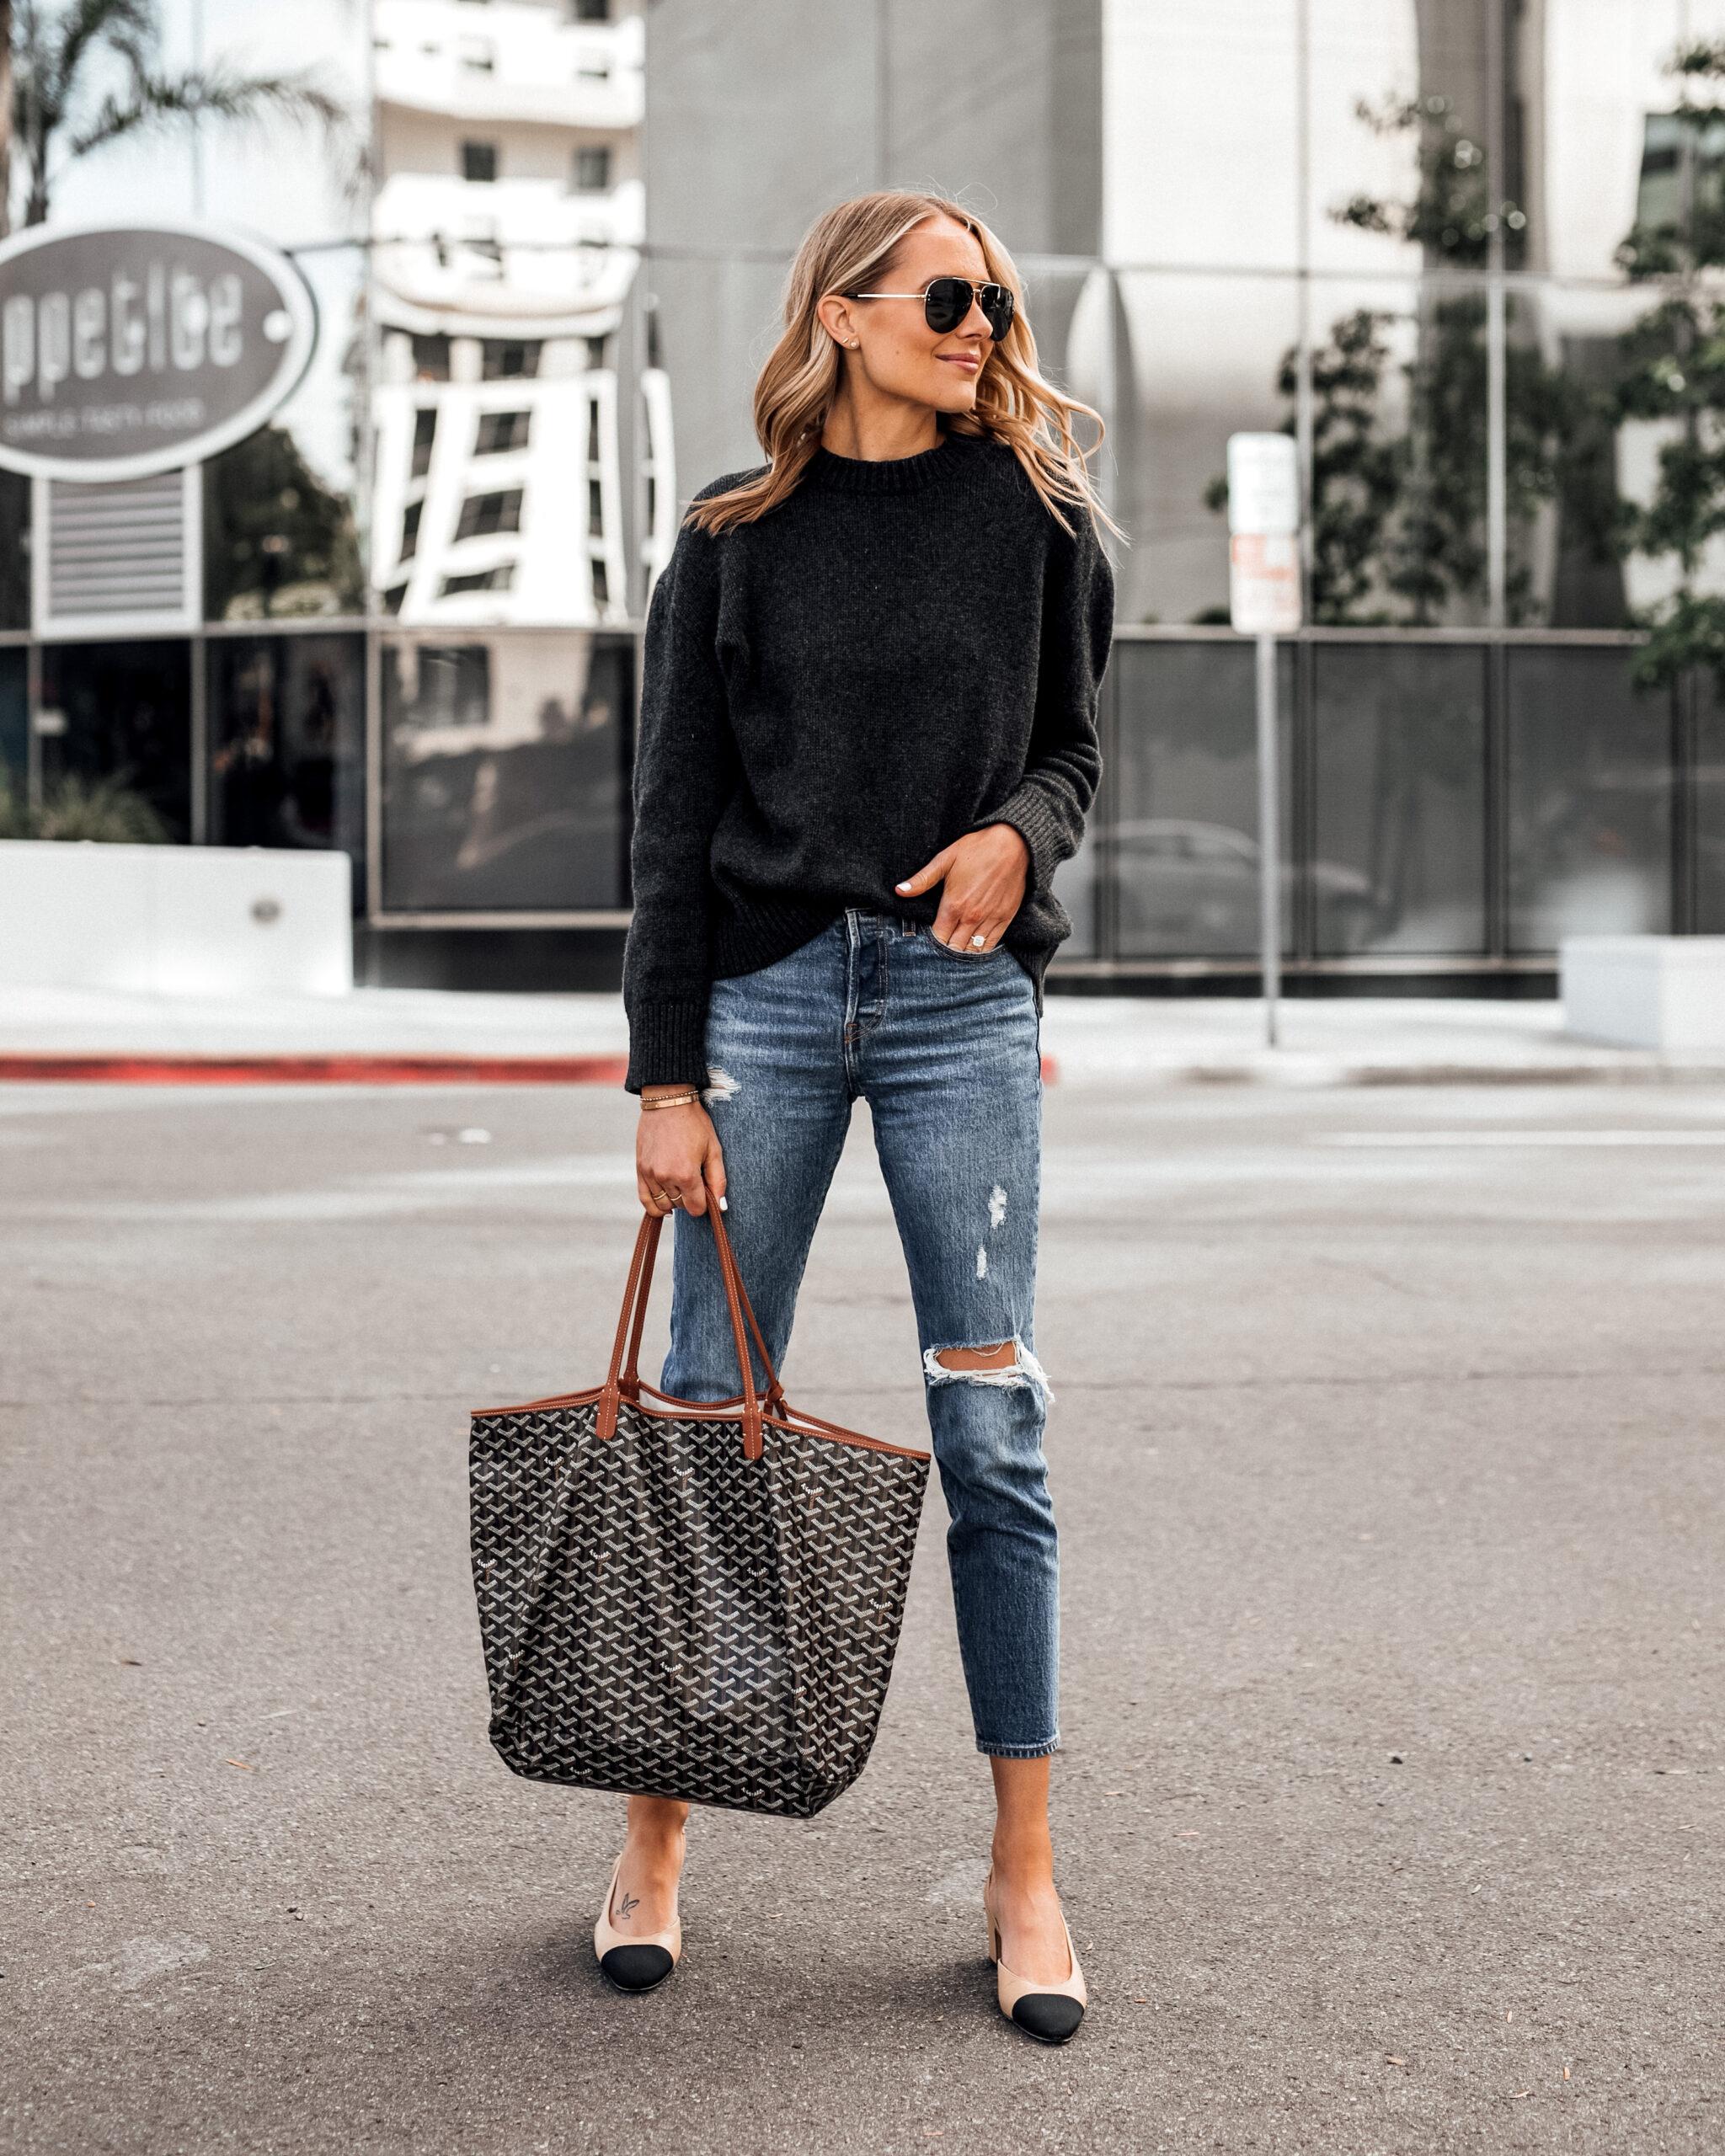 Fashion Jackson Wearing Grey Sweater Levis Ripped Jeans Goyard Tote Chanel Slingbacks